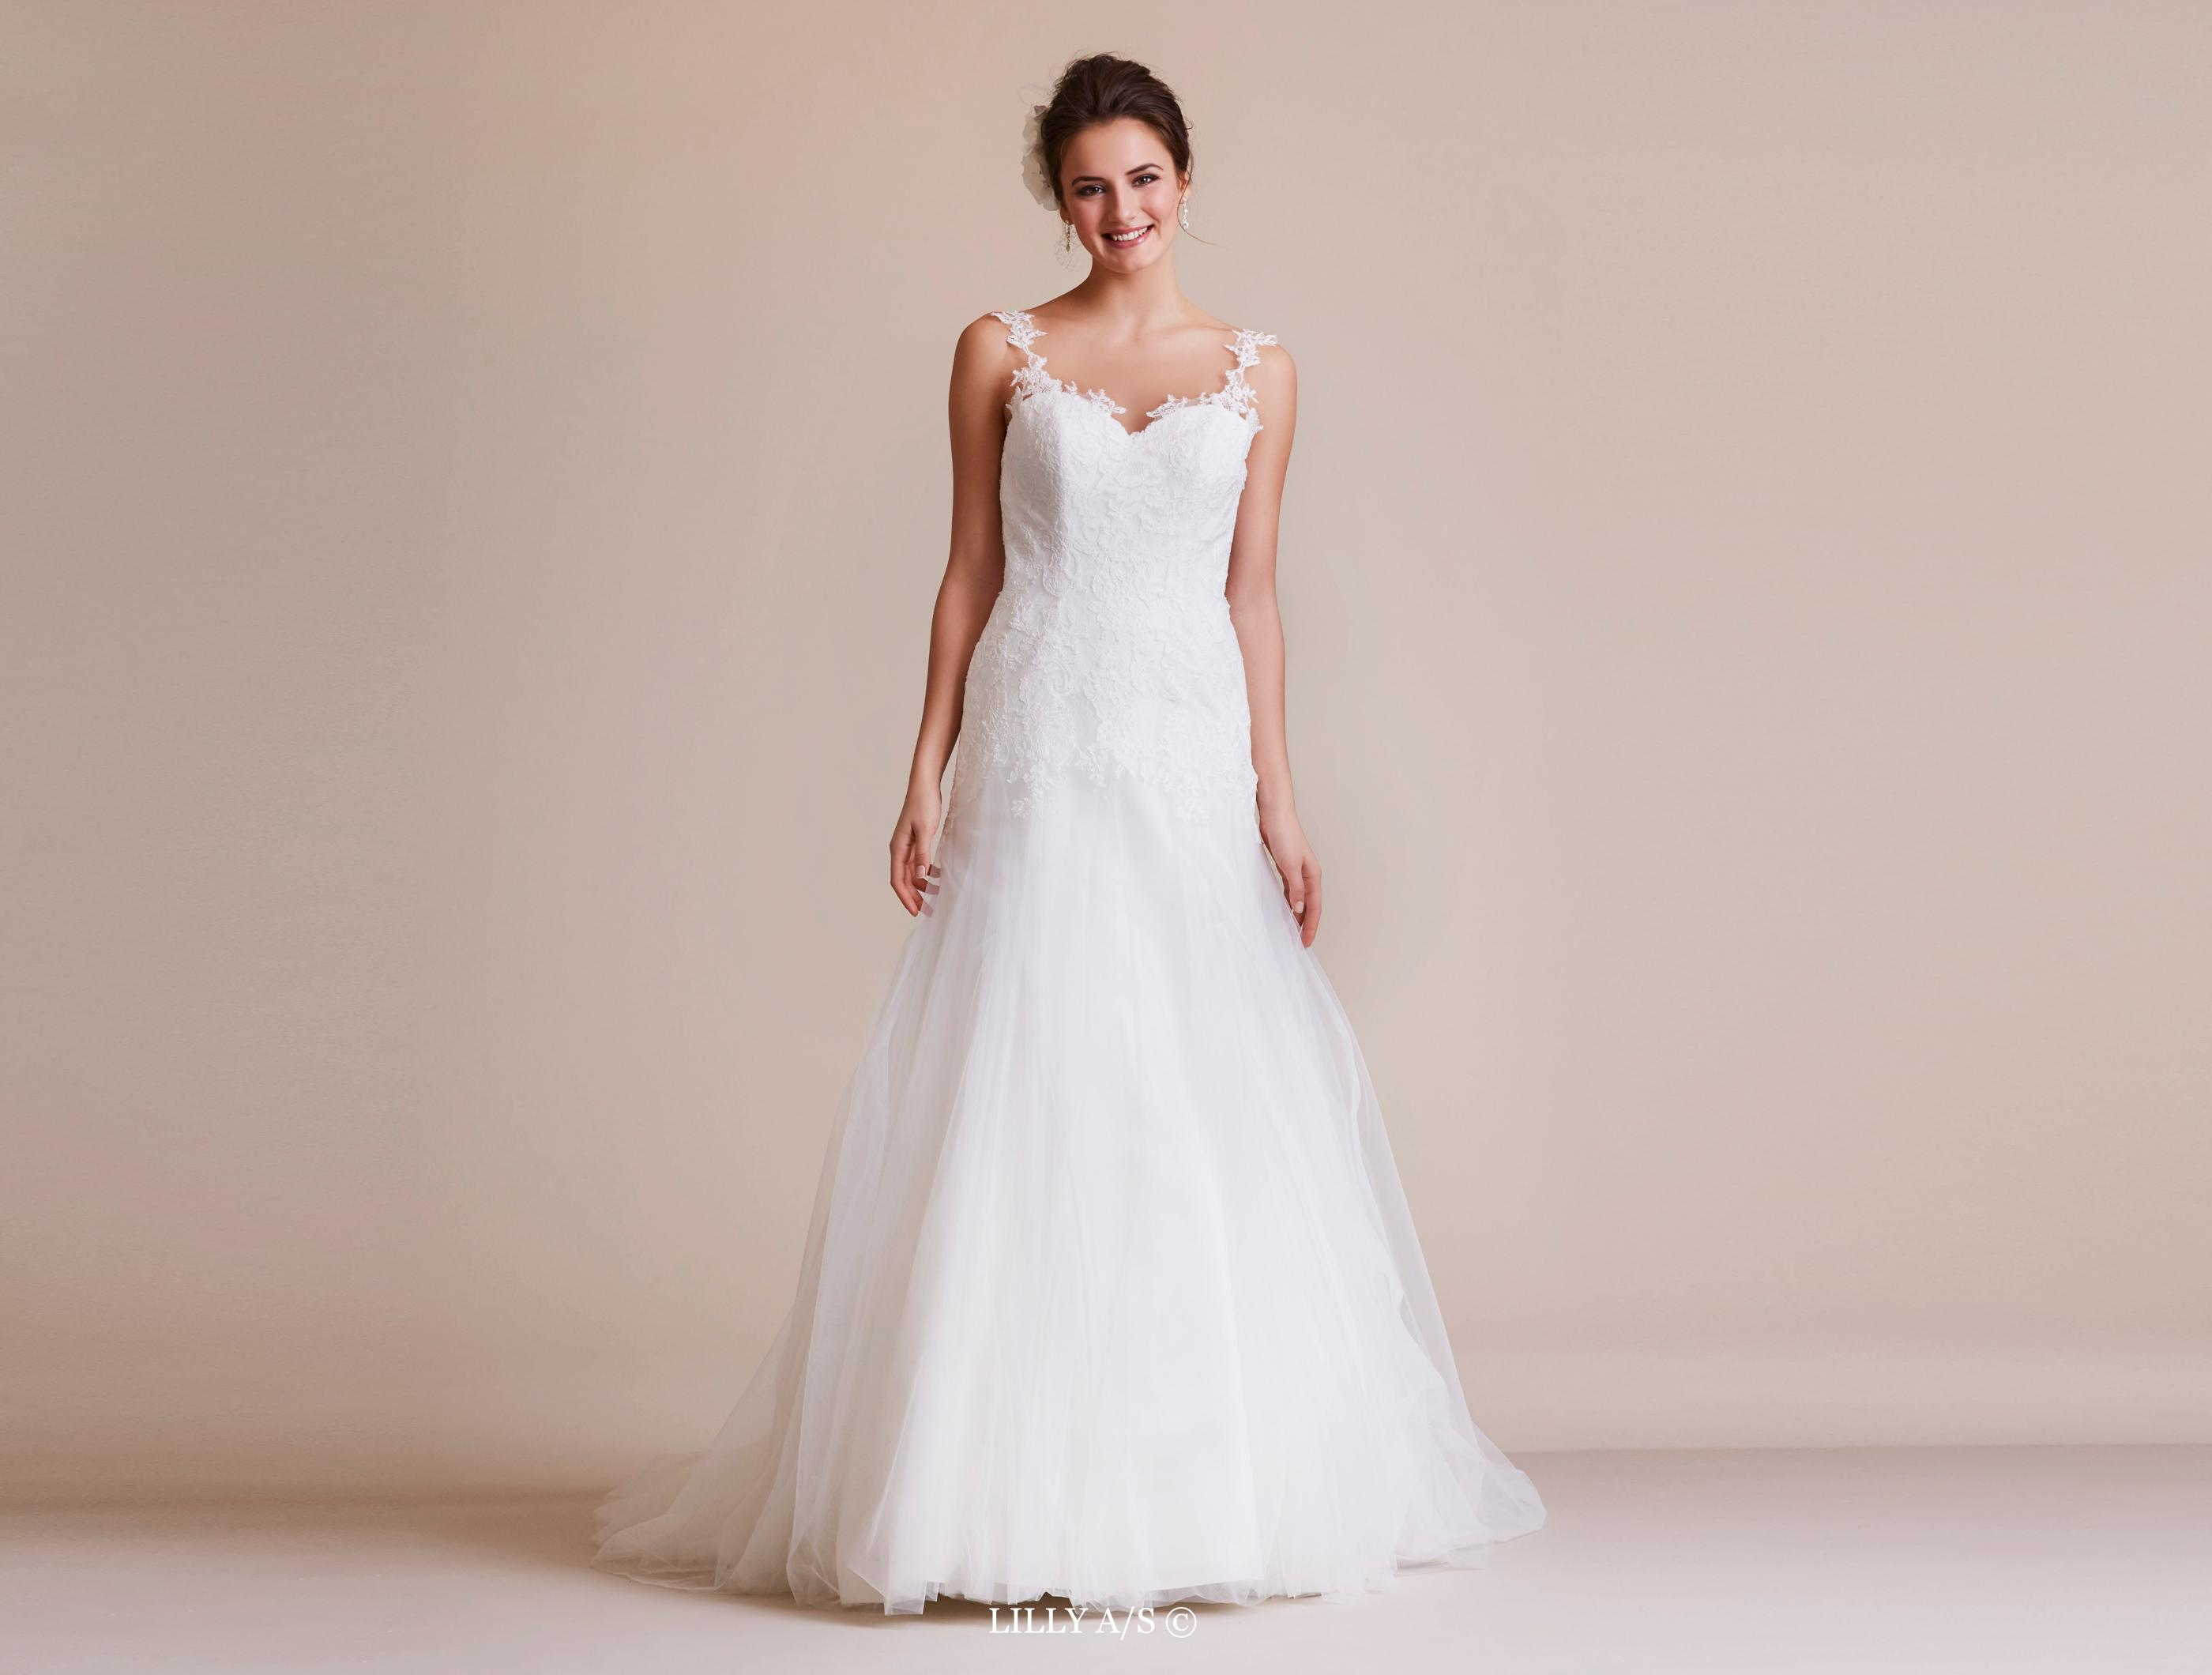 313837722cf Figurnær brudekjole med blonde